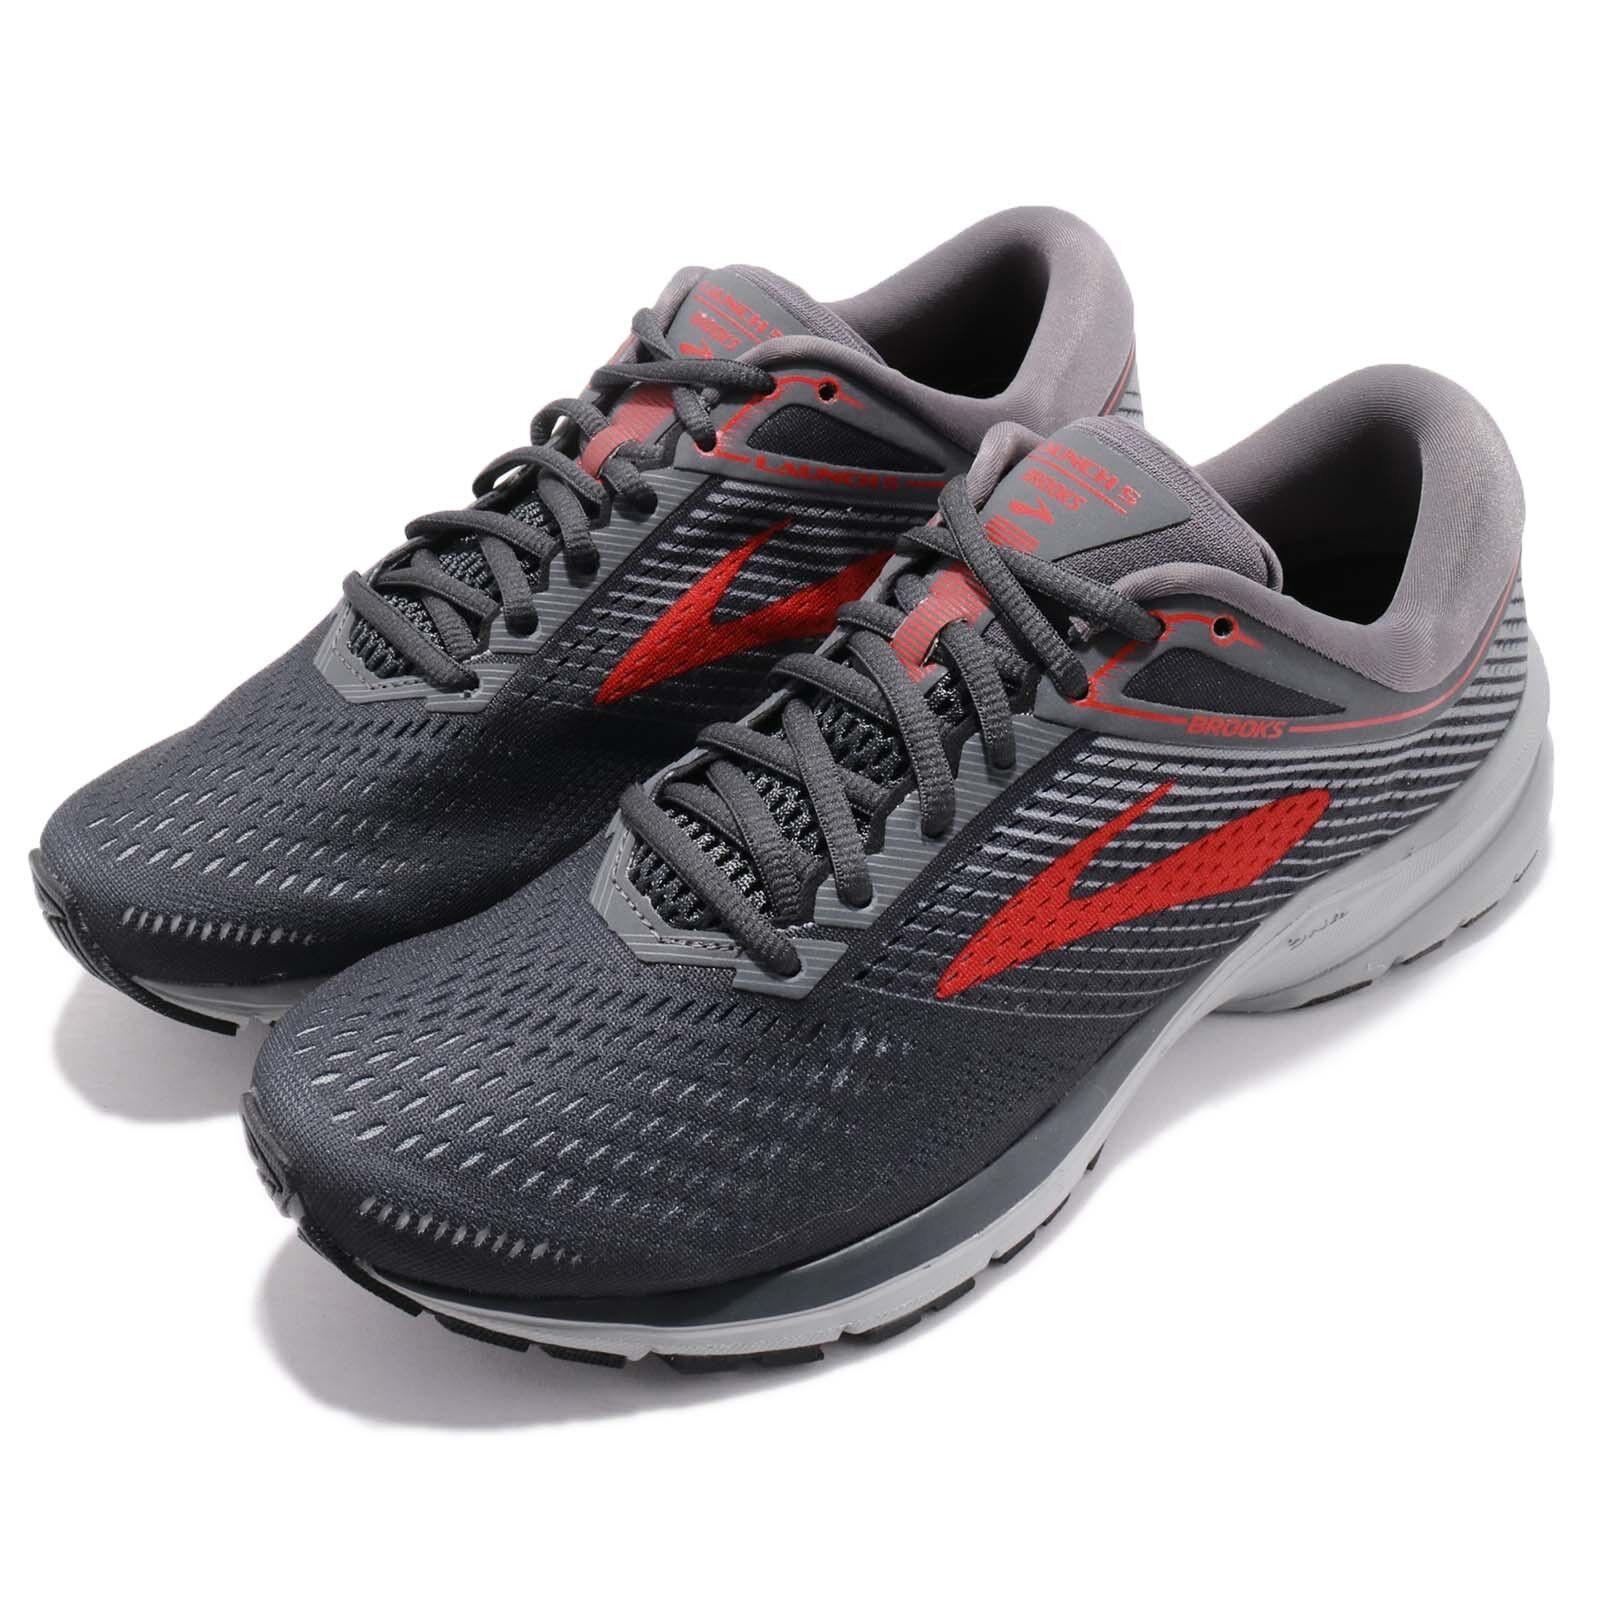 Brooks Launch 5 V grau rot Sie Marathon Laufen schuhe Turnschuhe 110278 1D